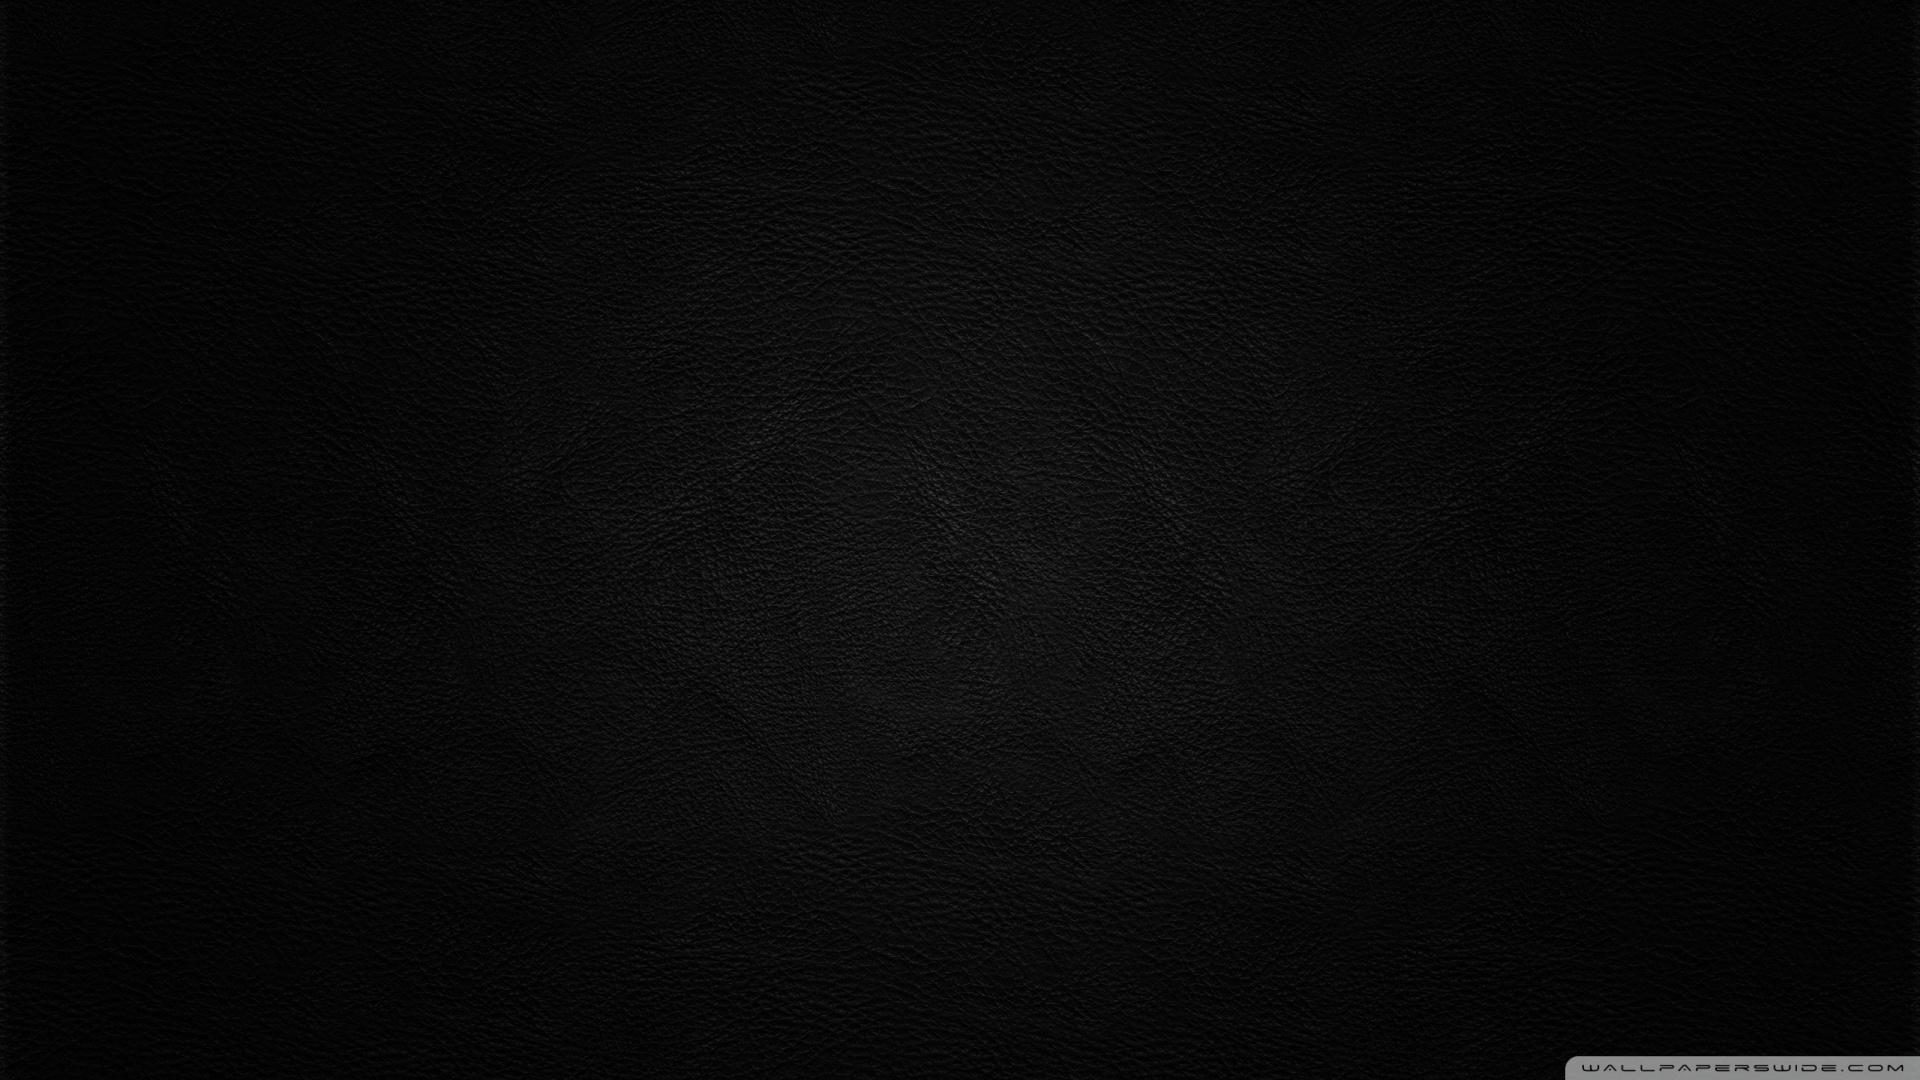 Black-Best-wallpaper-wp3603452